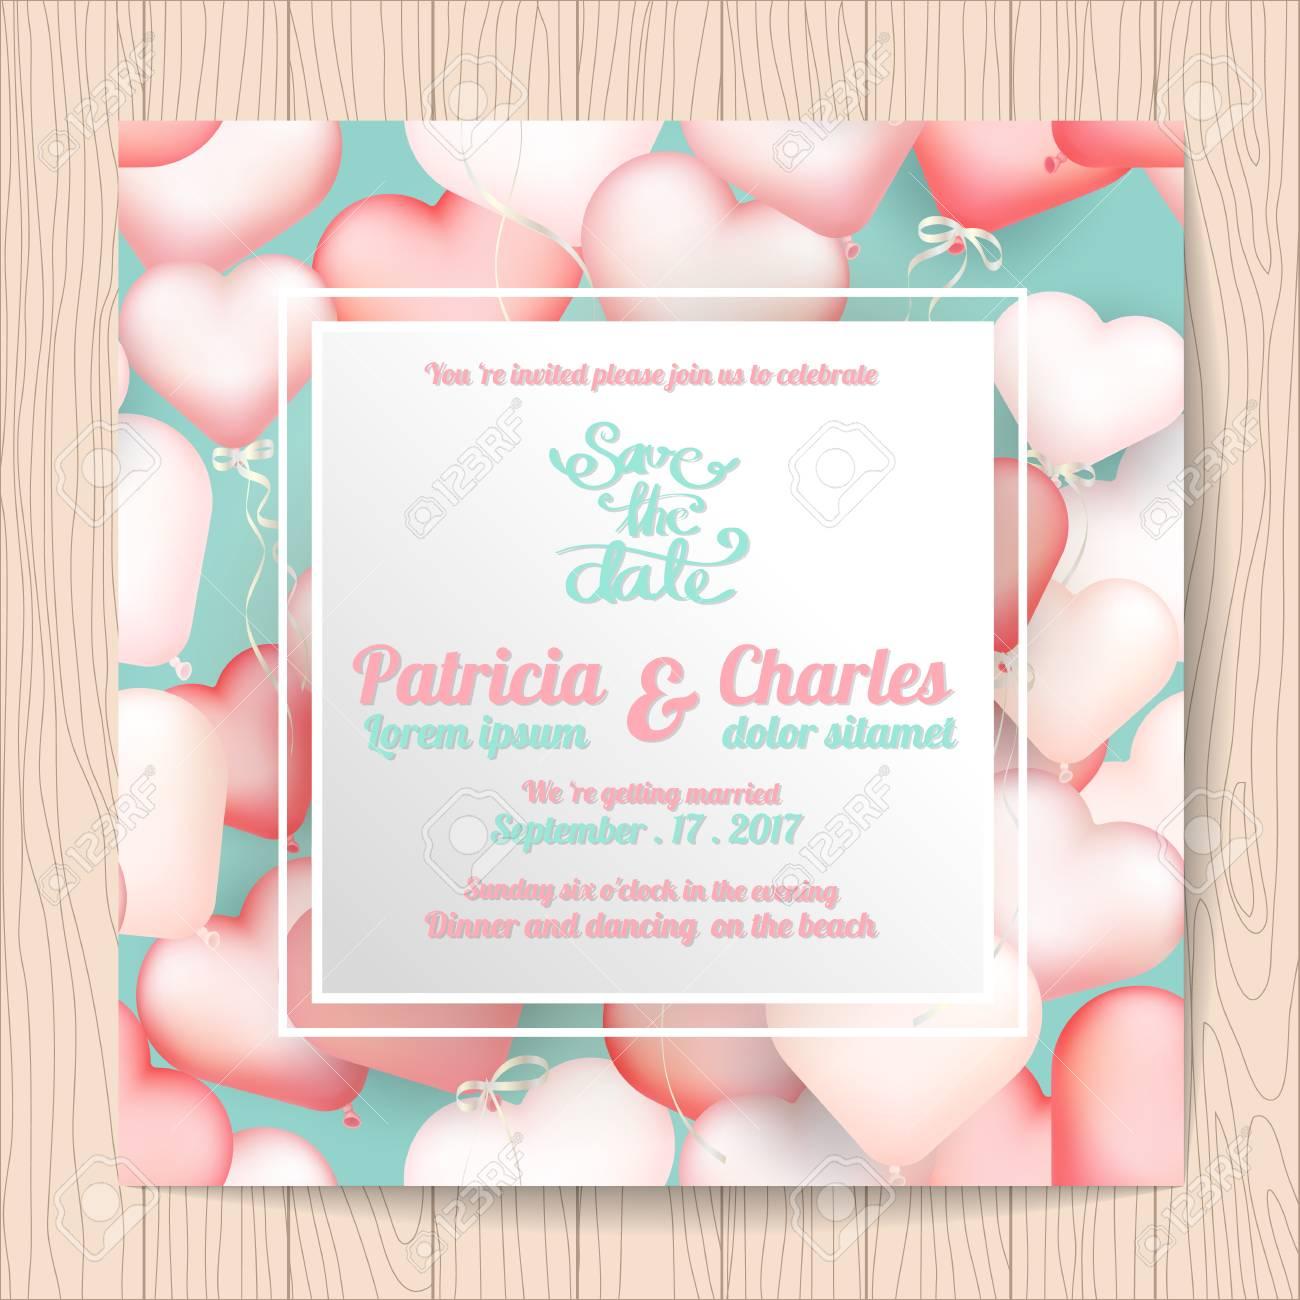 Wedding Invitation Card Templates Sweet Heart Balloon Background